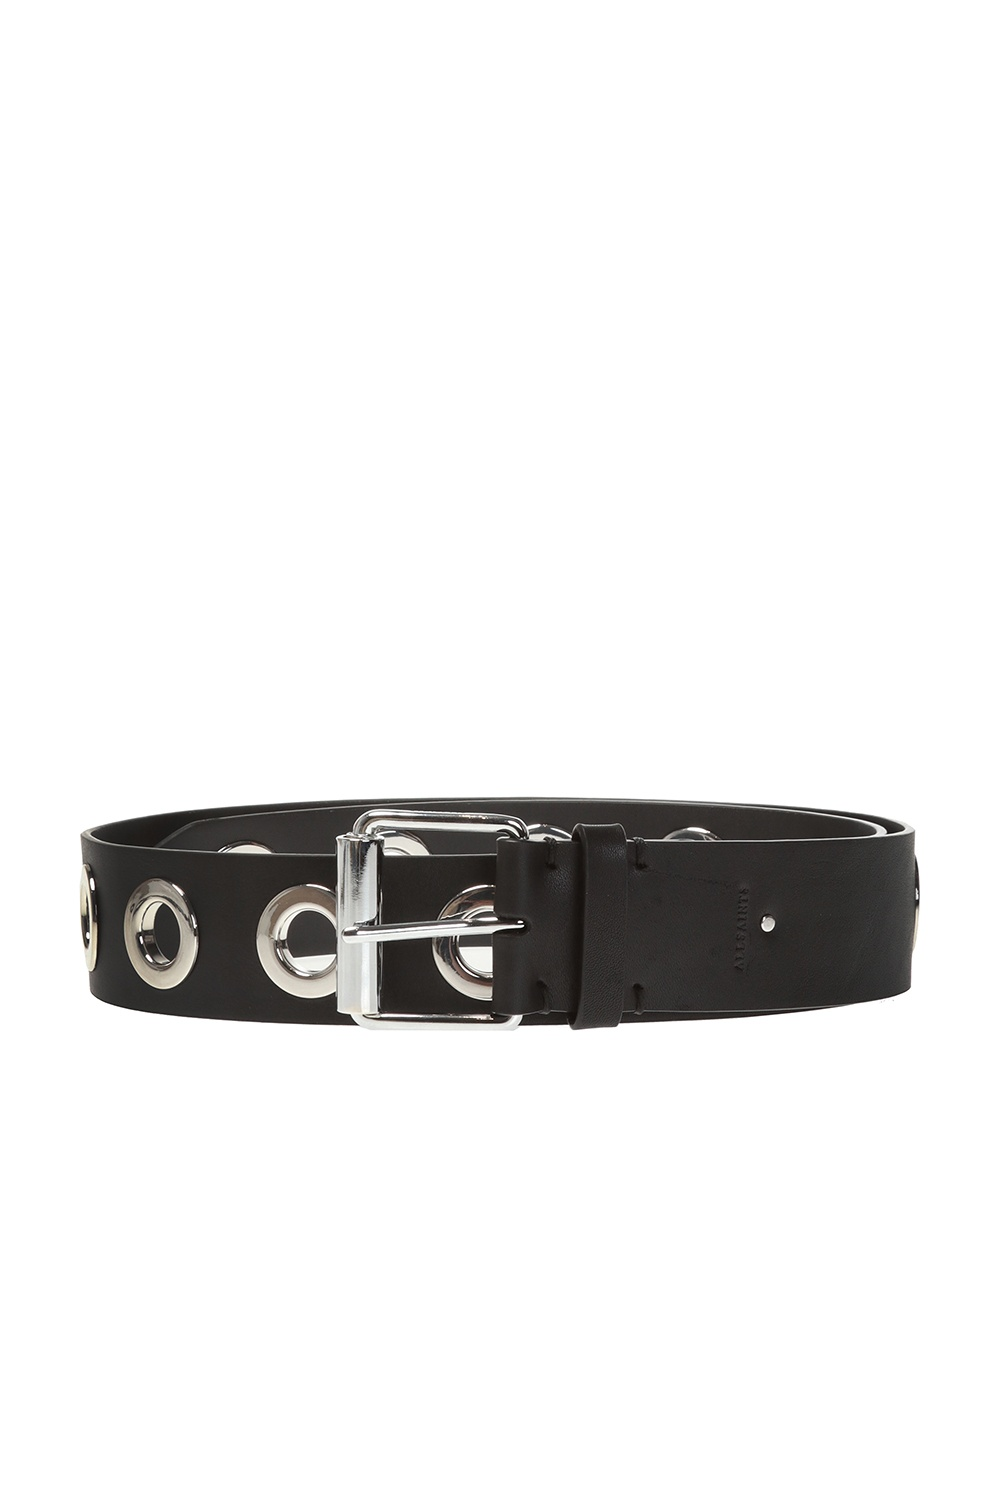 AllSaints 'Dani' Belt with logo